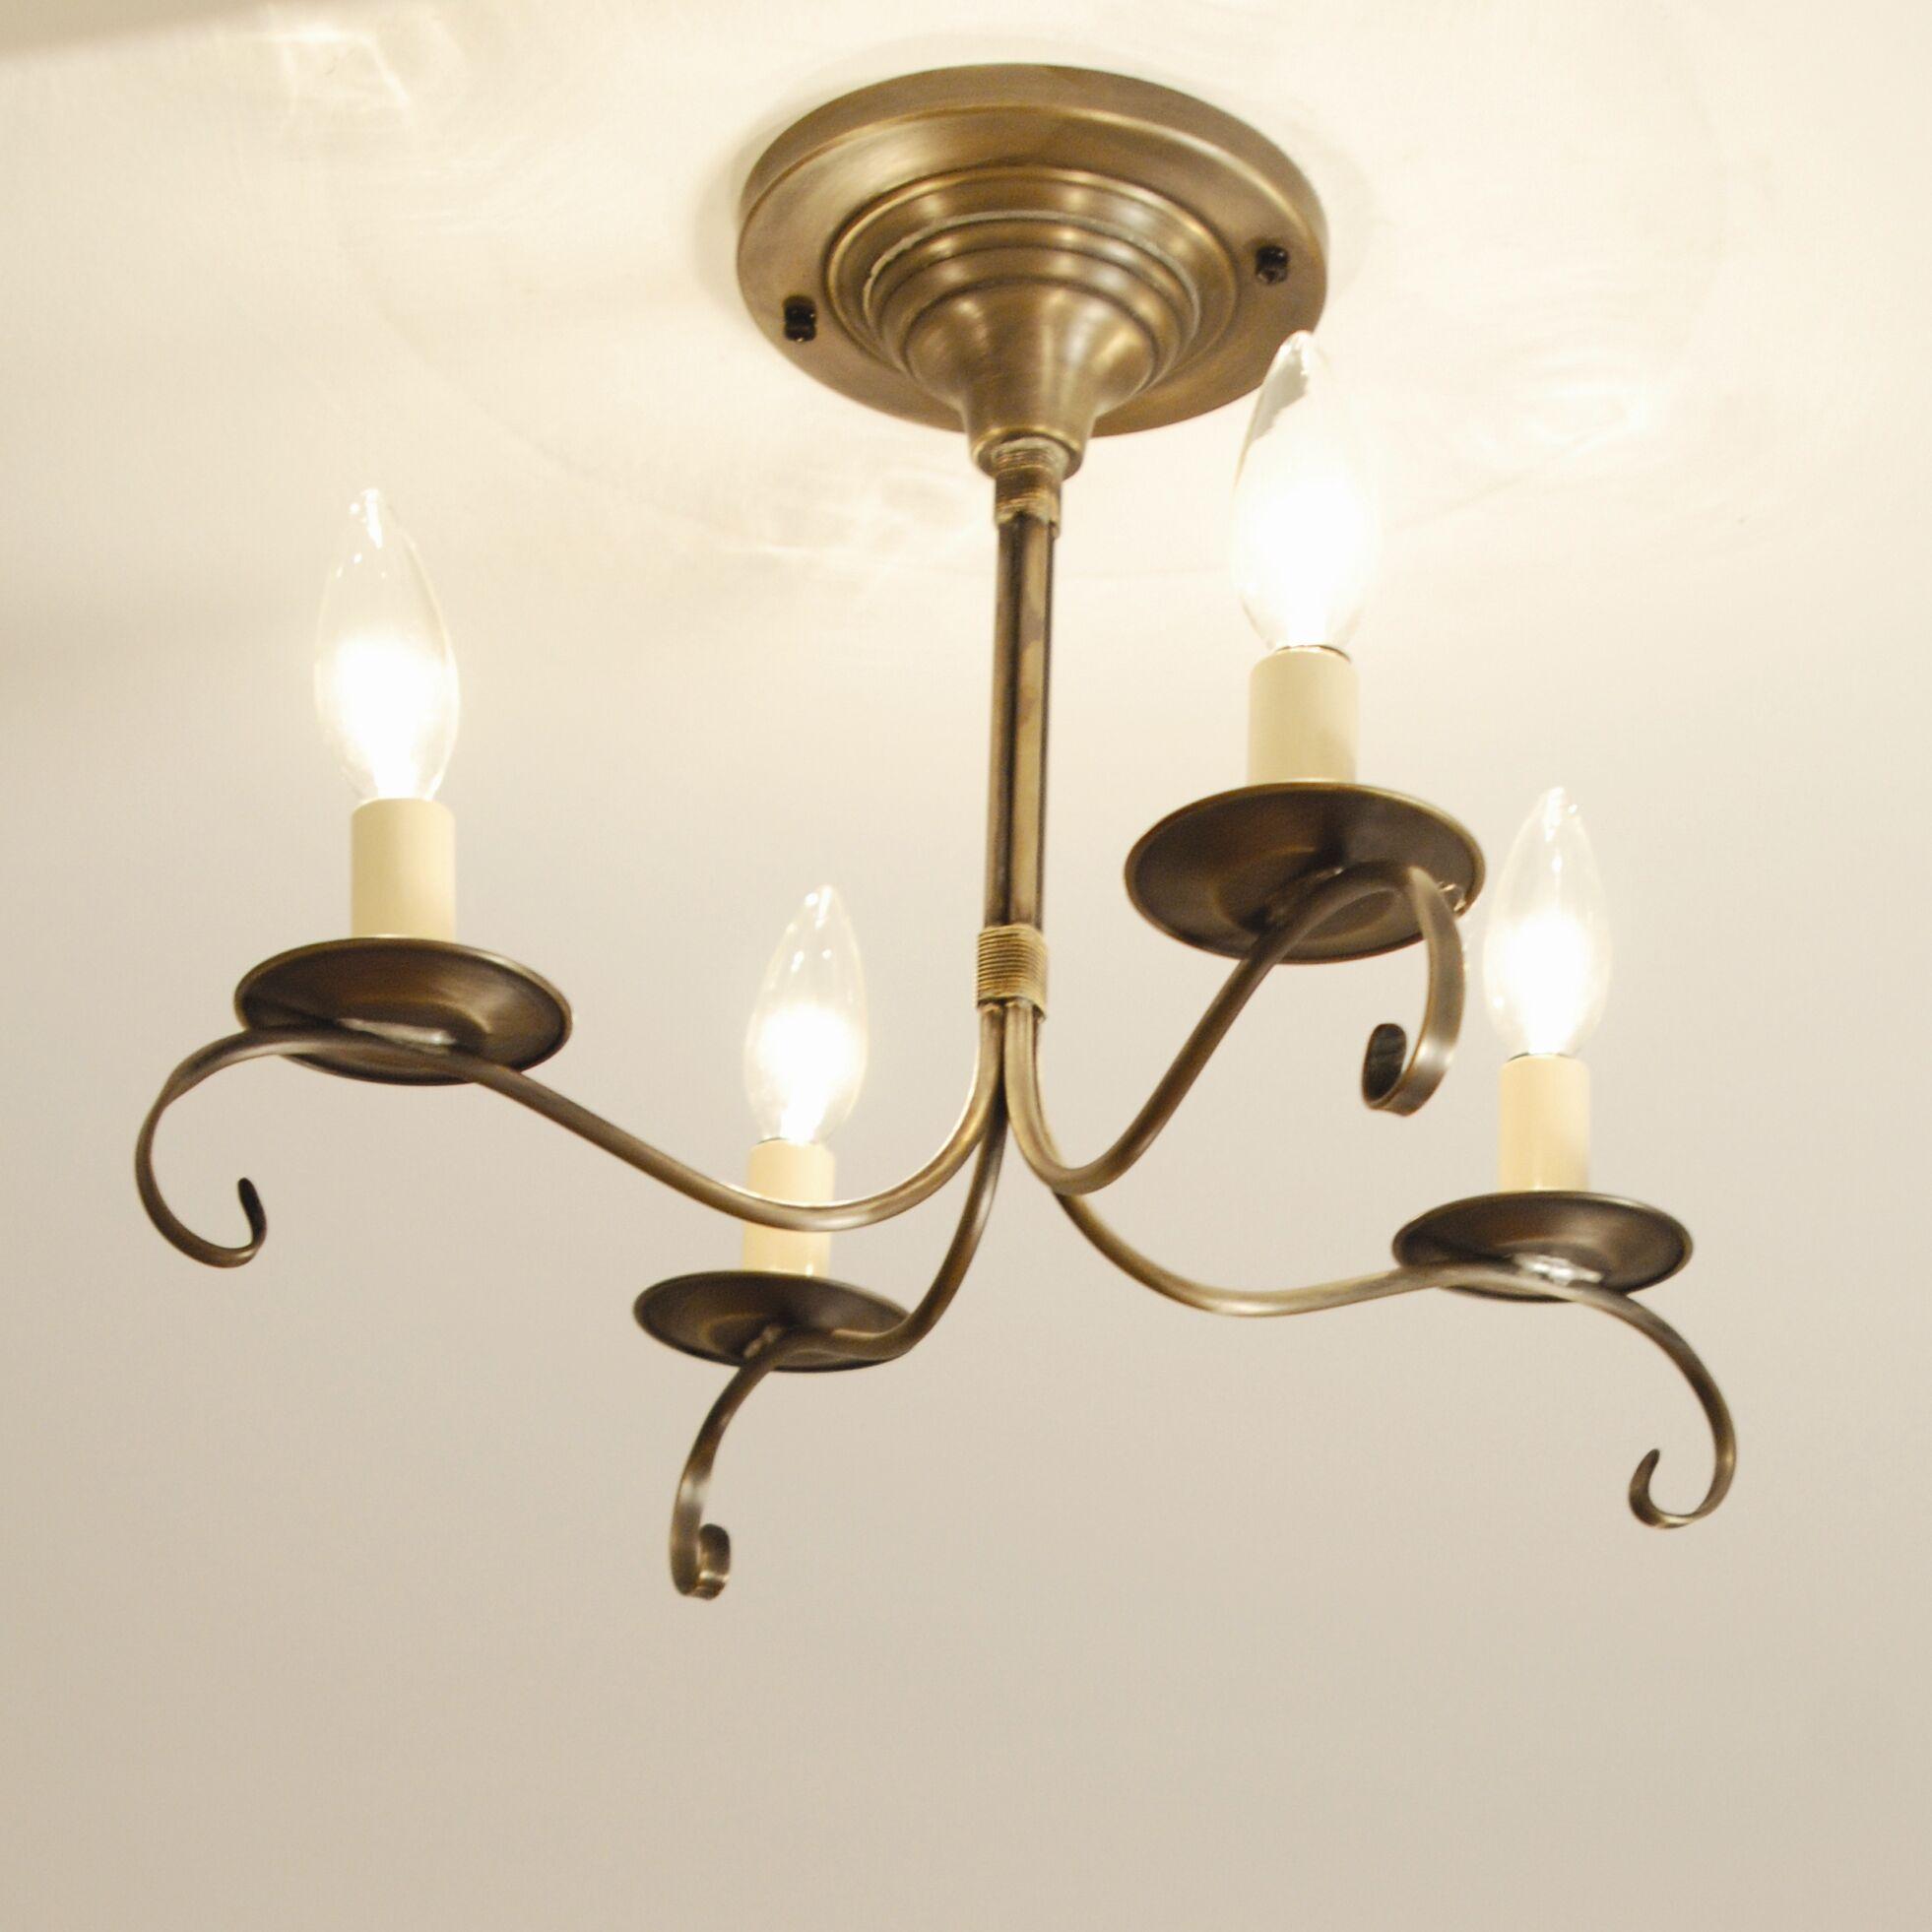 Chandelier 4-Light Candle Style Chandelier Finish: Verdi Gris